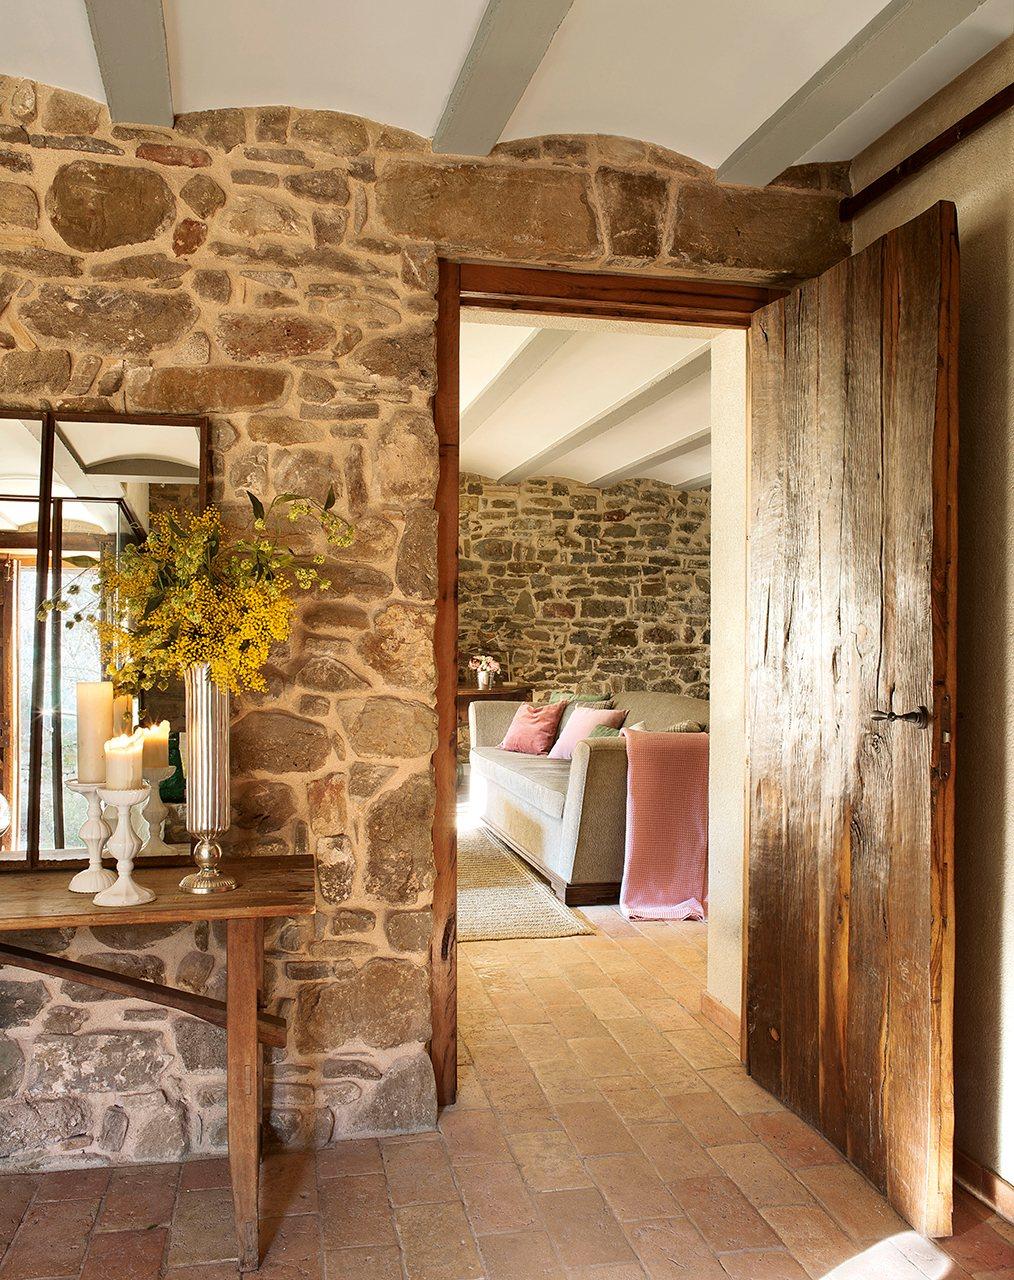 Masía del s. XVI reconvertida en espectacular casa rural en La Garroxta, Girona